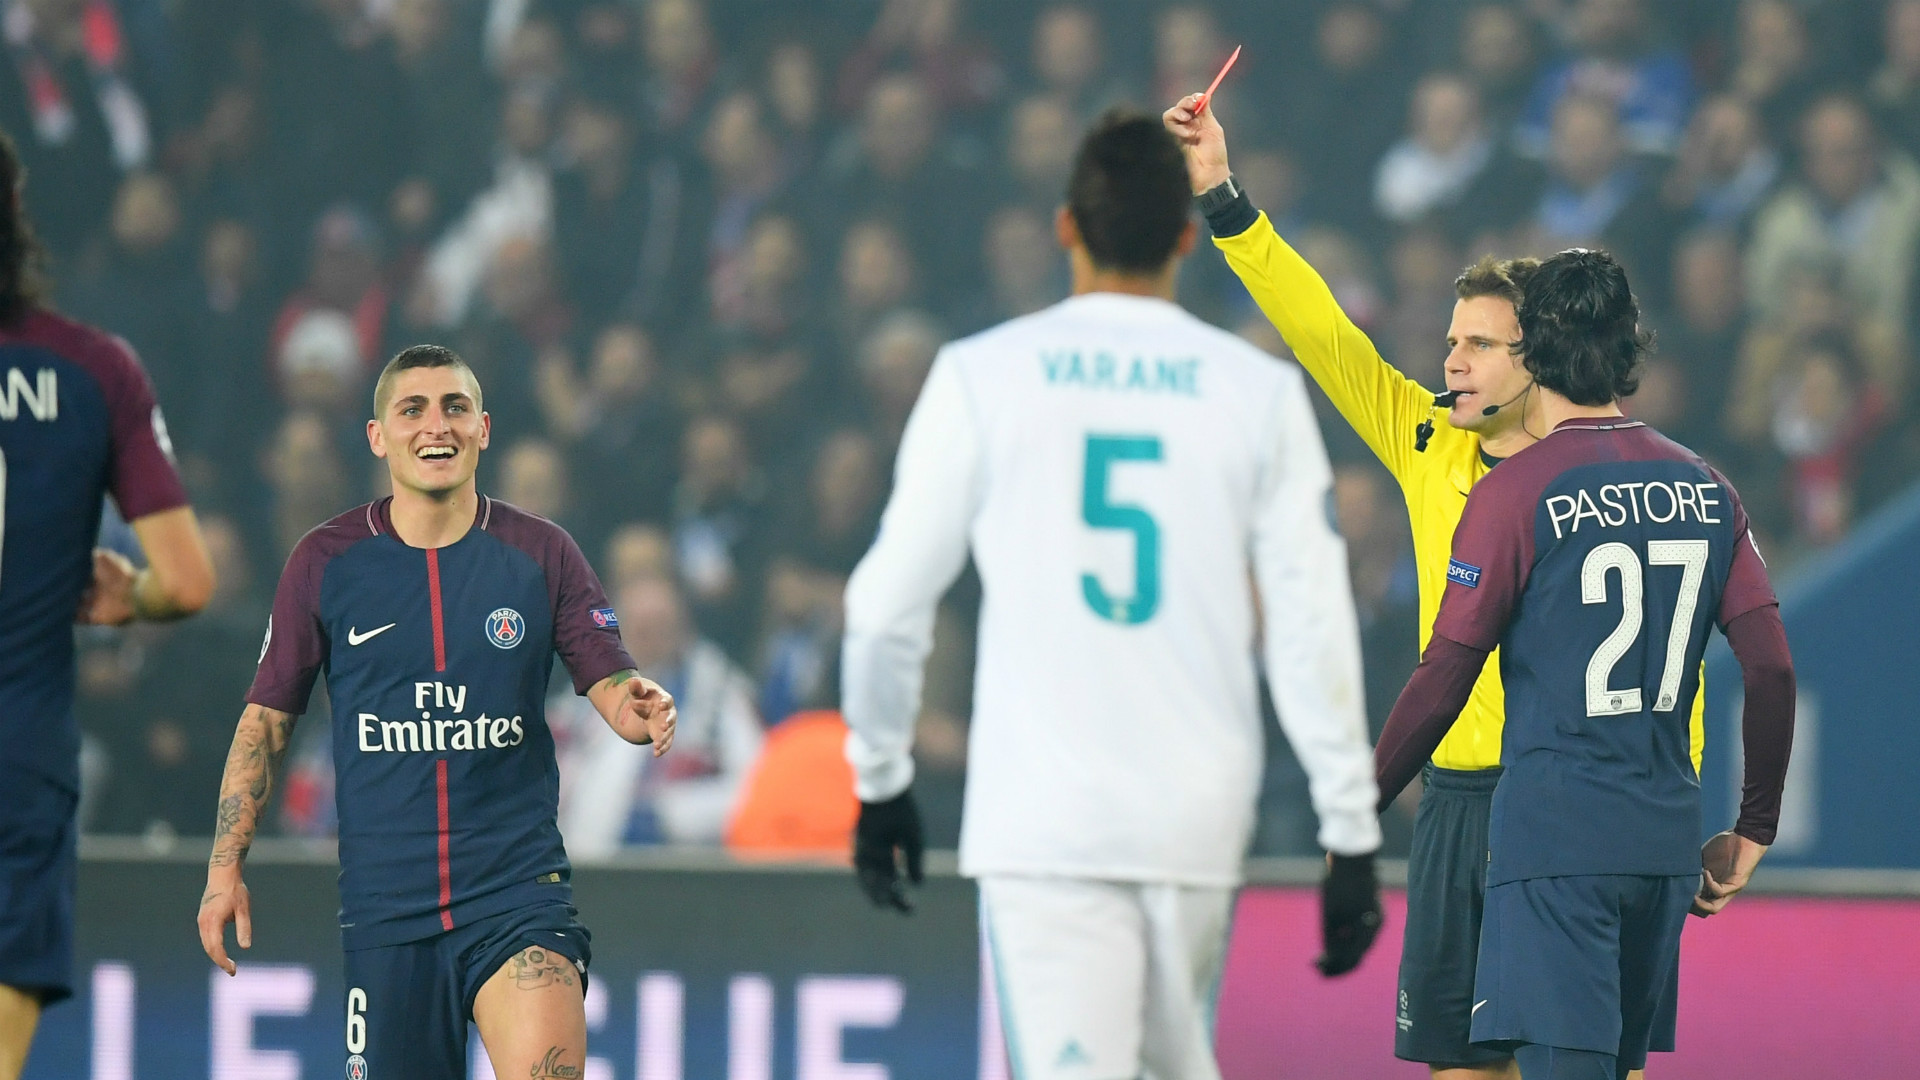 Marco Verratti PSG Paris Saint-Germain